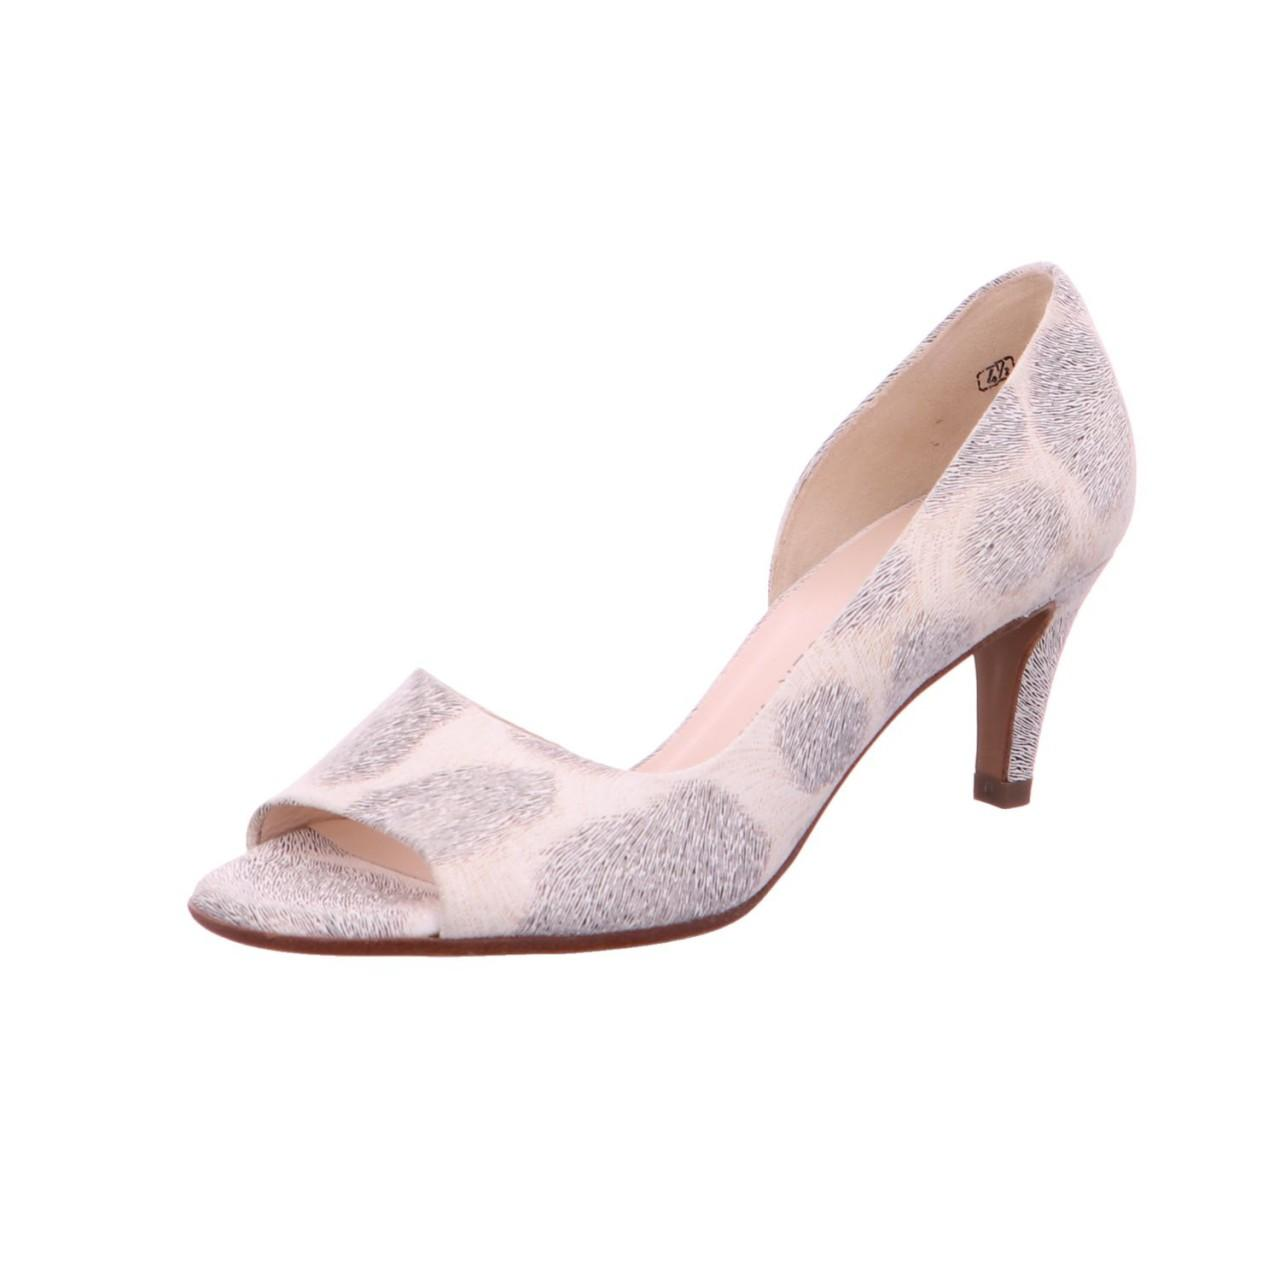 peter kaiser shoes sale uk, Peter Kaiser JAMALA Peep toes